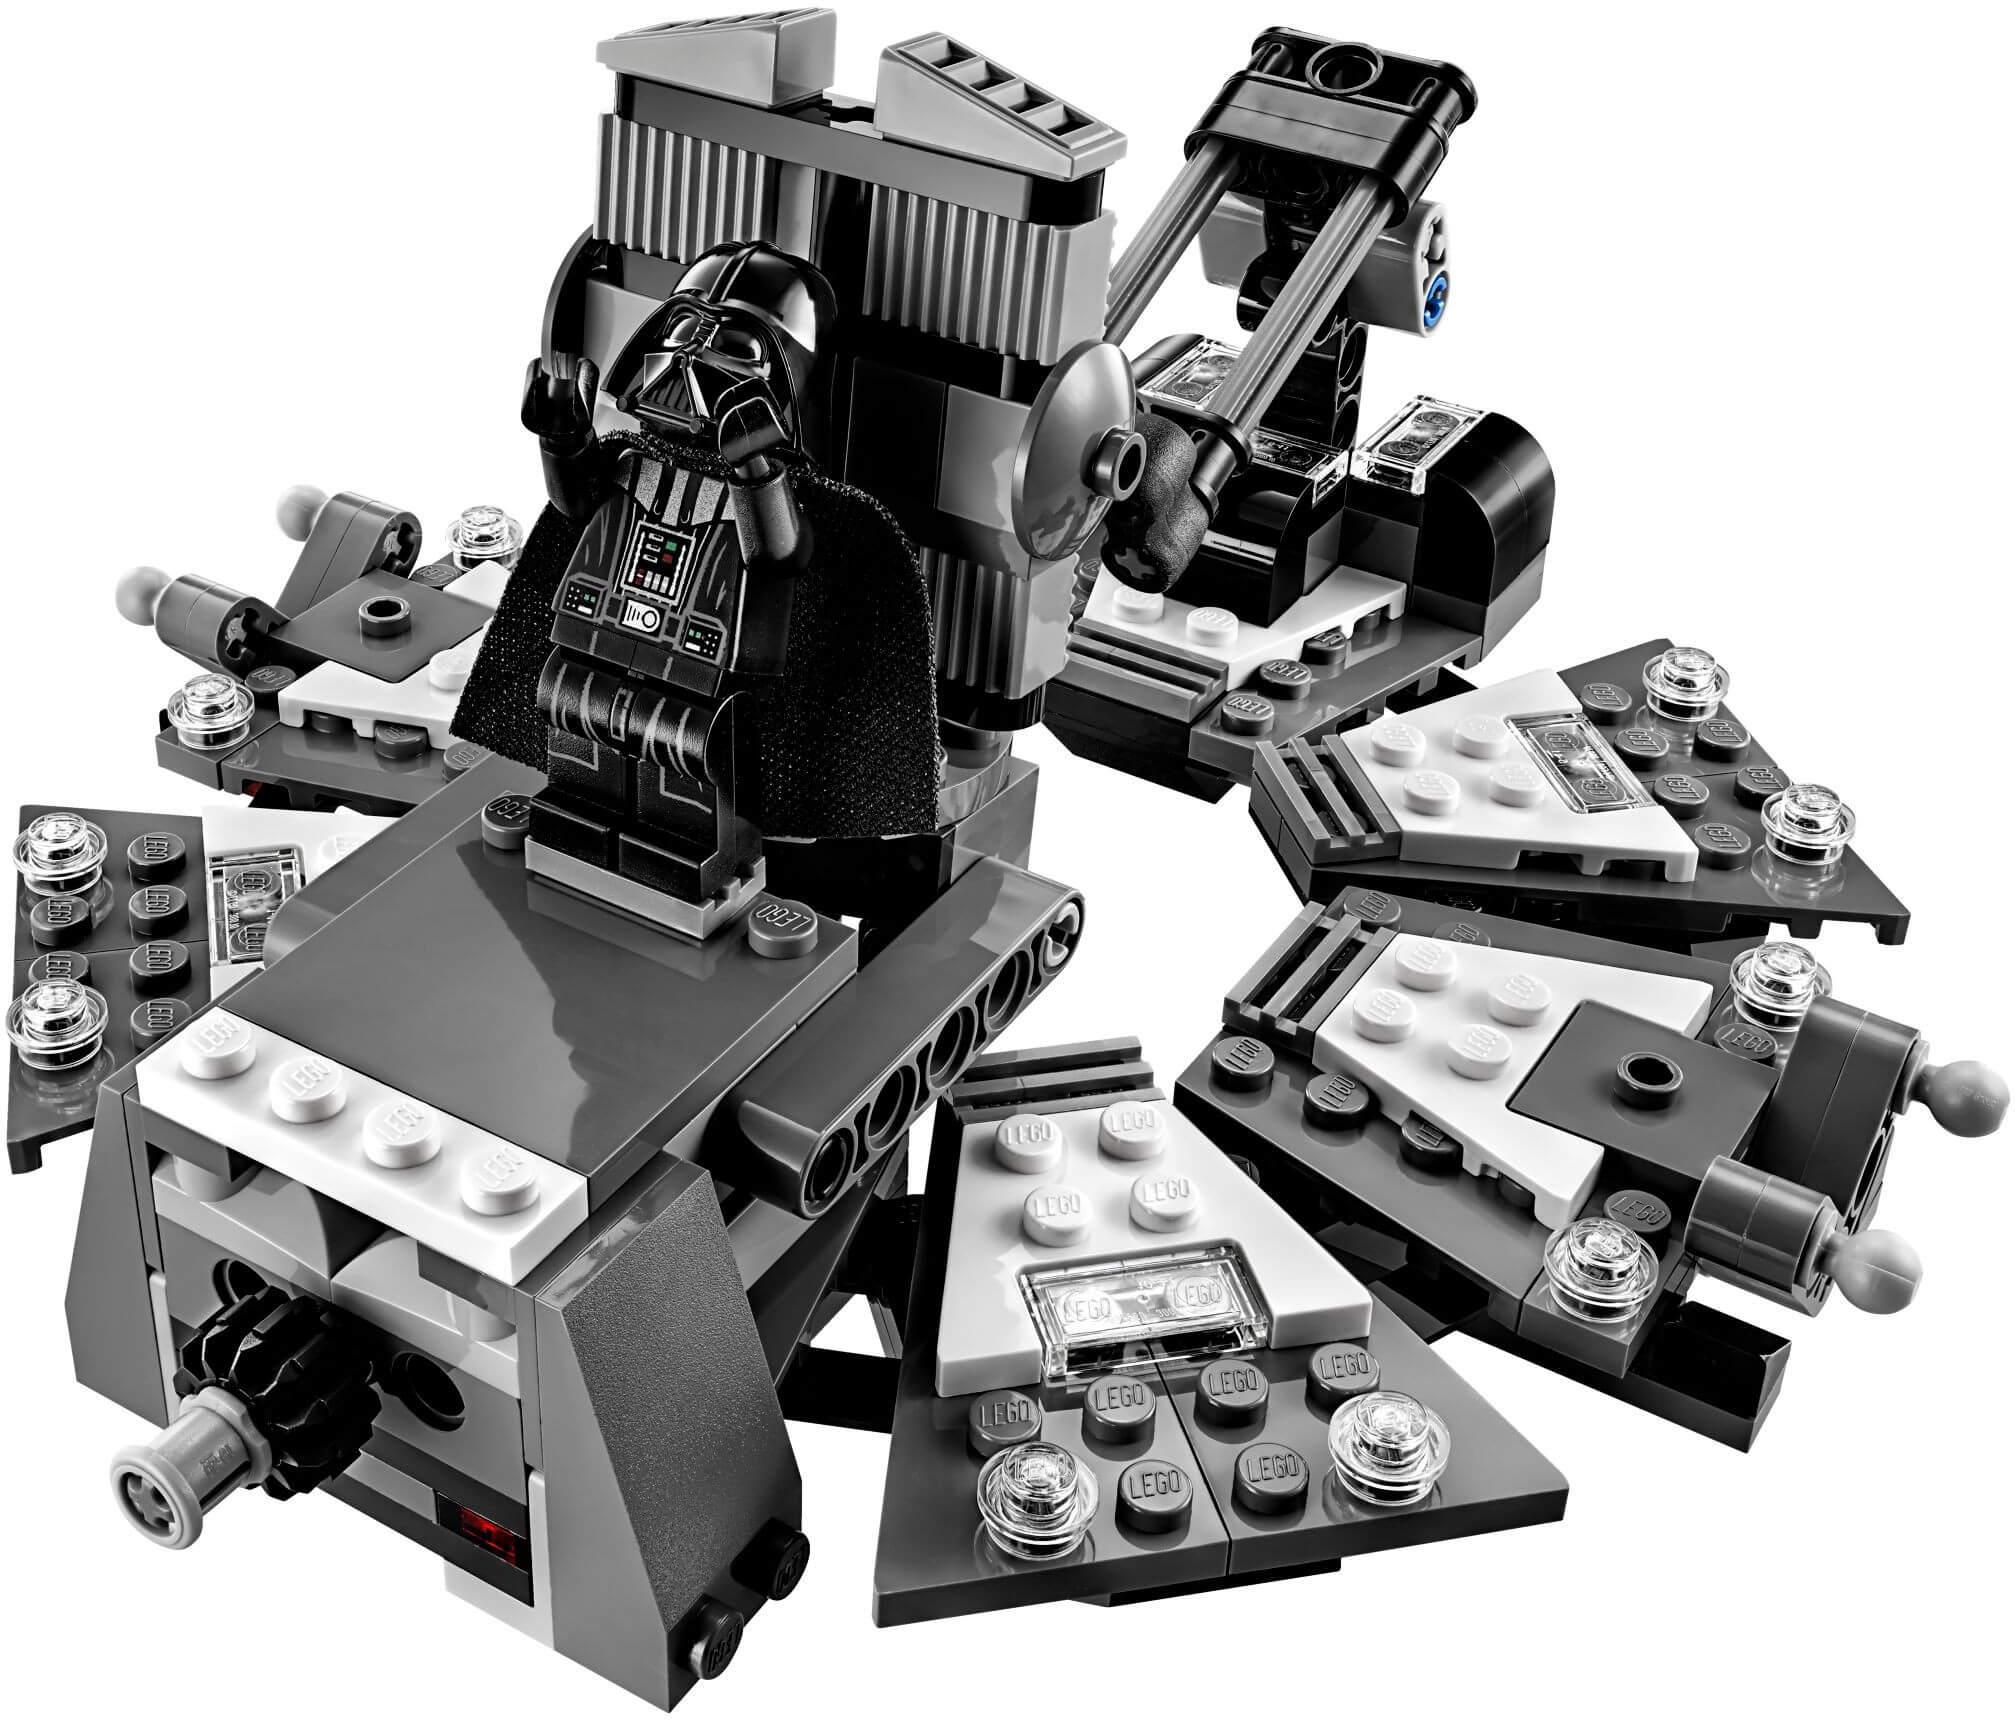 Mua đồ chơi LEGO 75183 - LEGO Star Wars 75183 - Darth Vader tái sinh từ Anakin Skywalker (LEGO Star Wars Darth Vader Transformation)